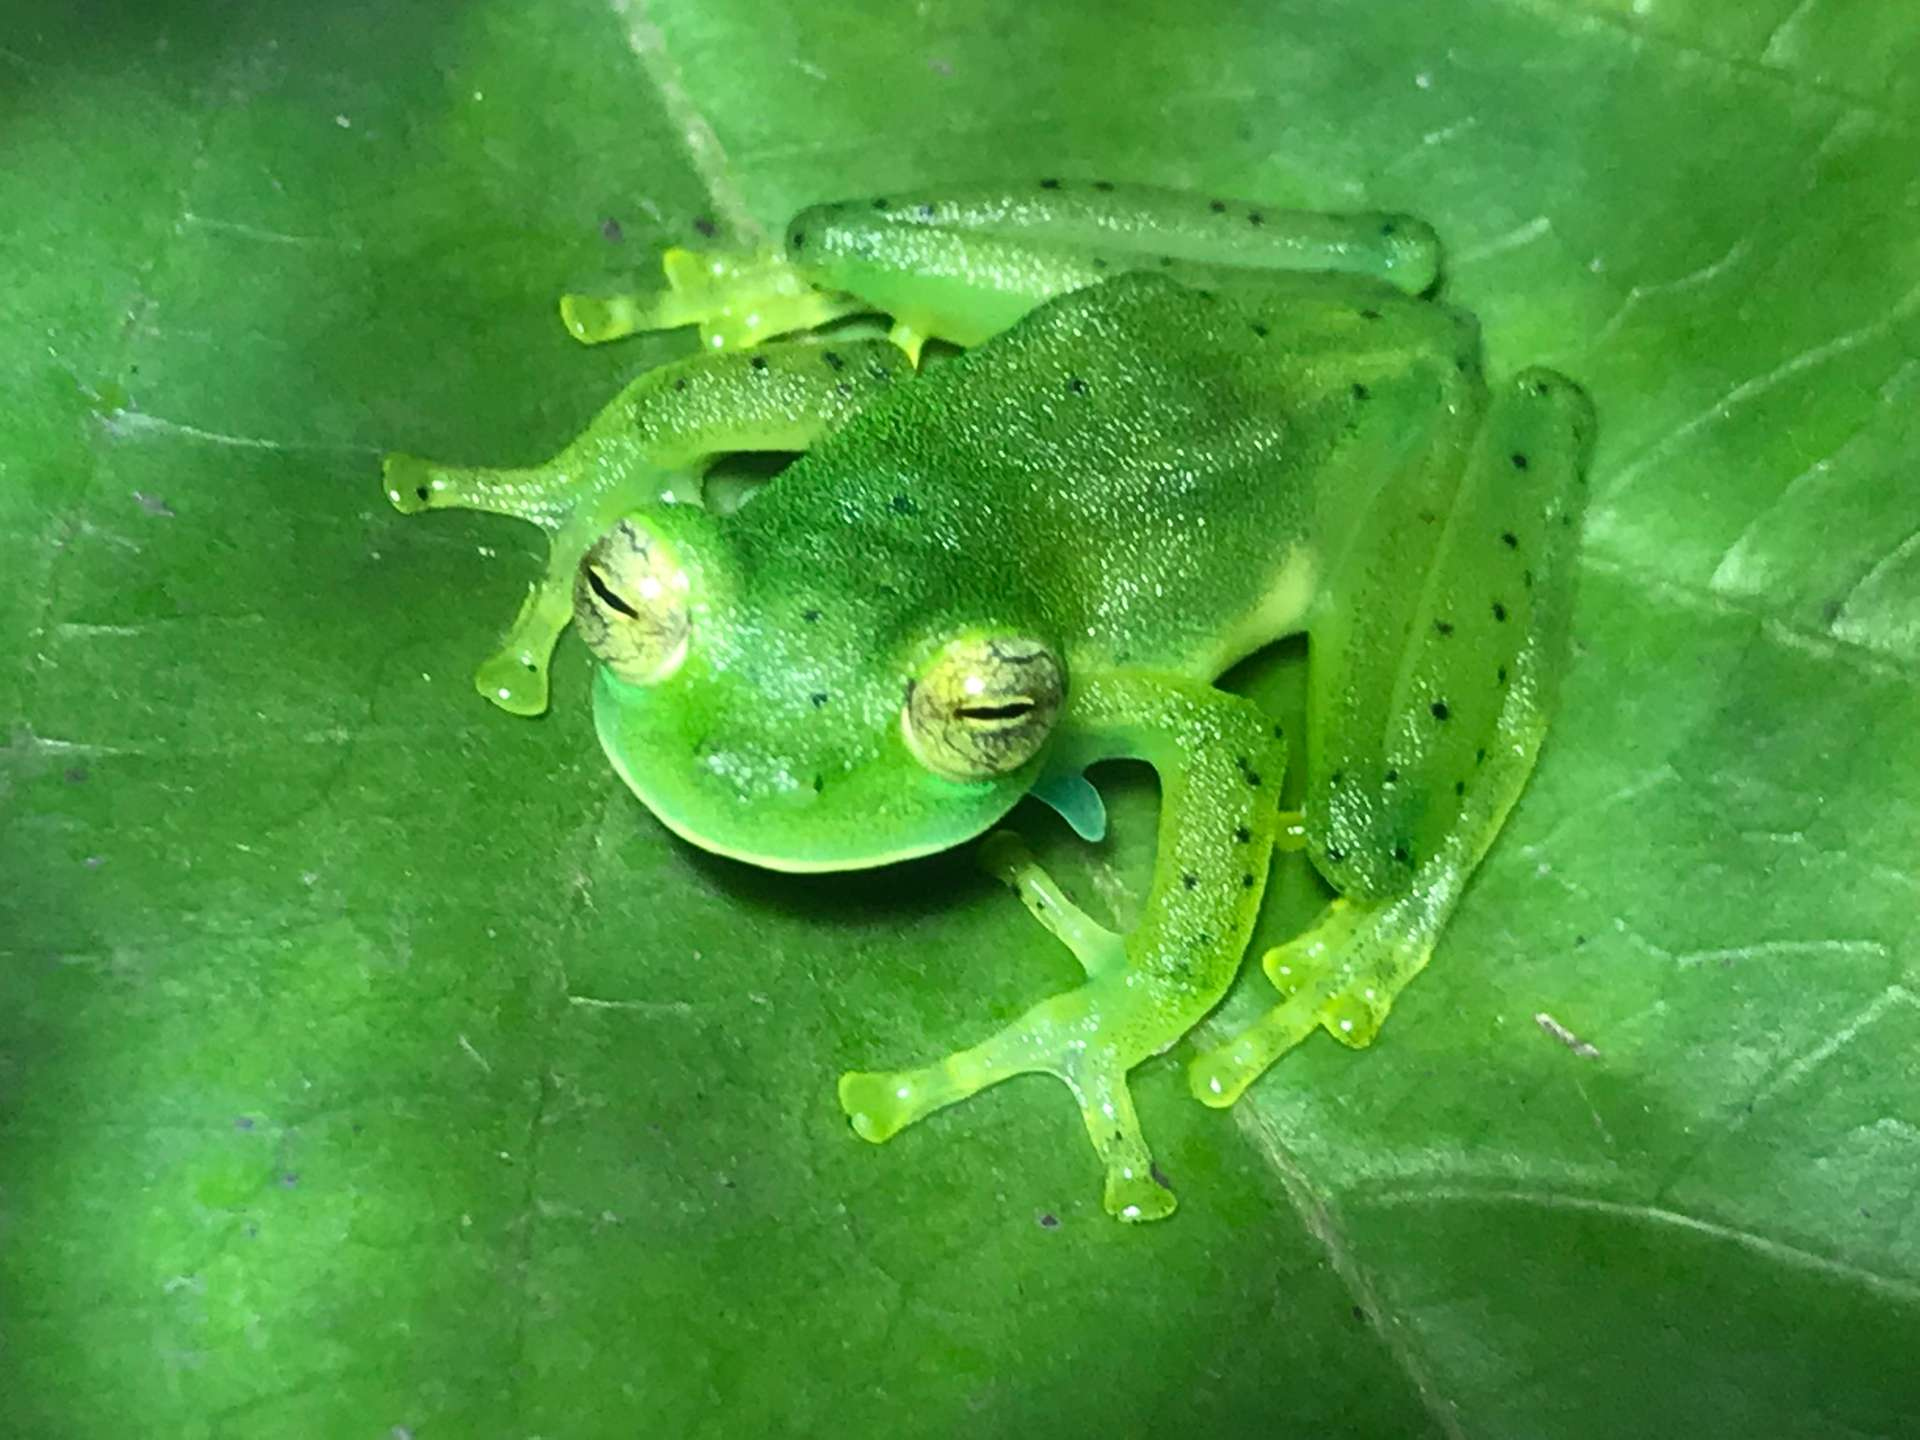 Costa Rica, Frog Pond, groene kikker